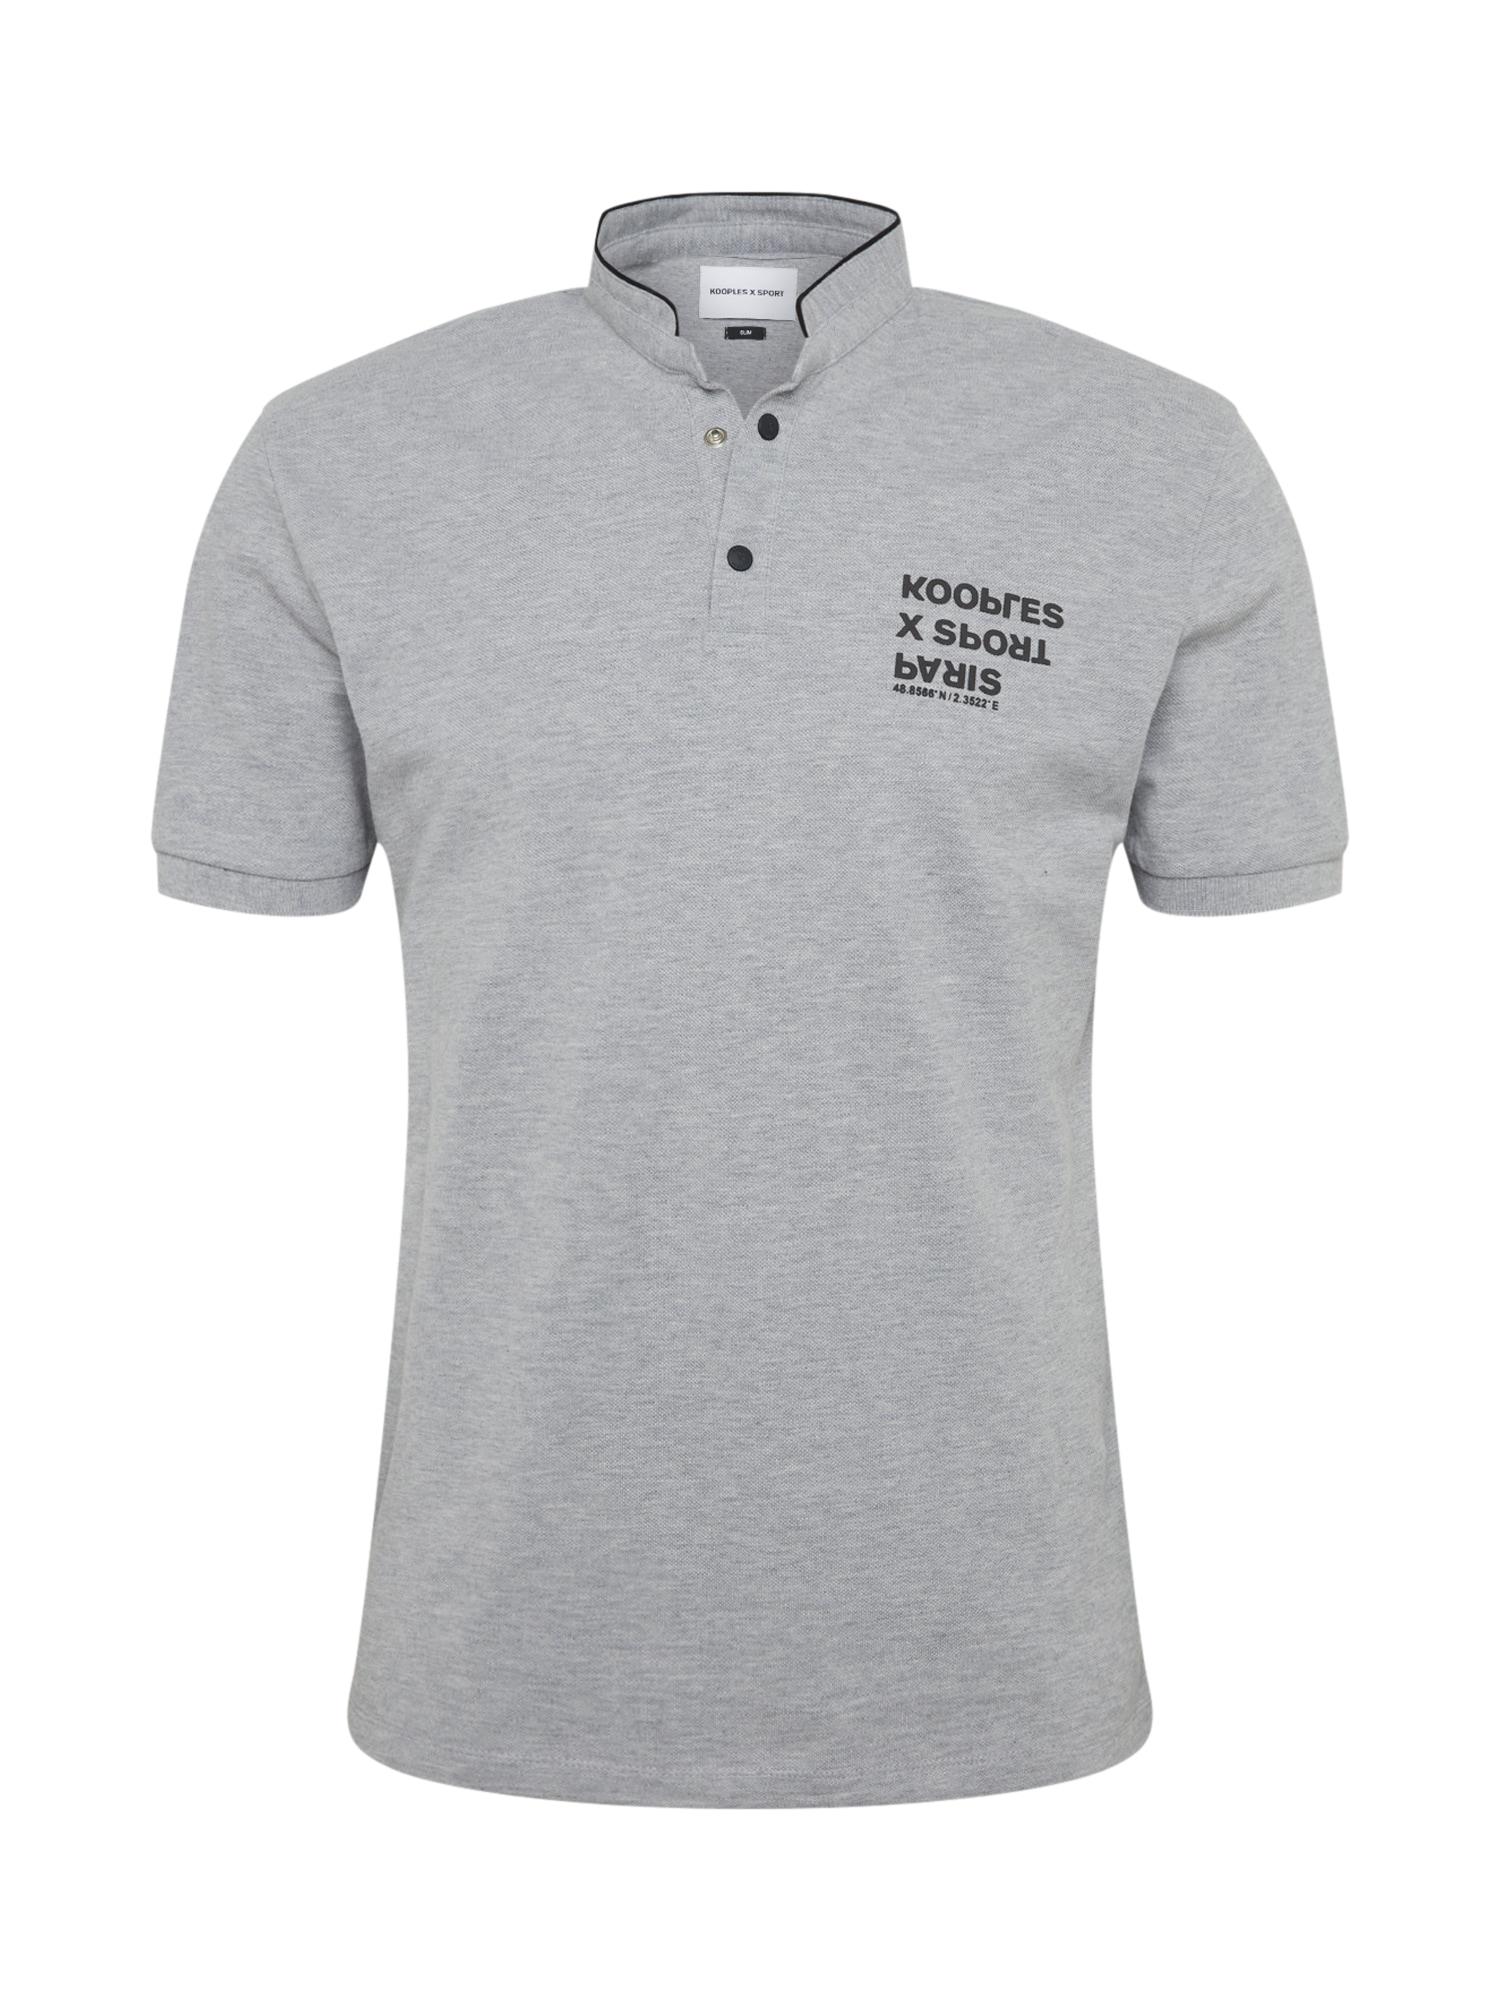 THE KOOPLES SPORT Marškinėliai margai pilka / juoda